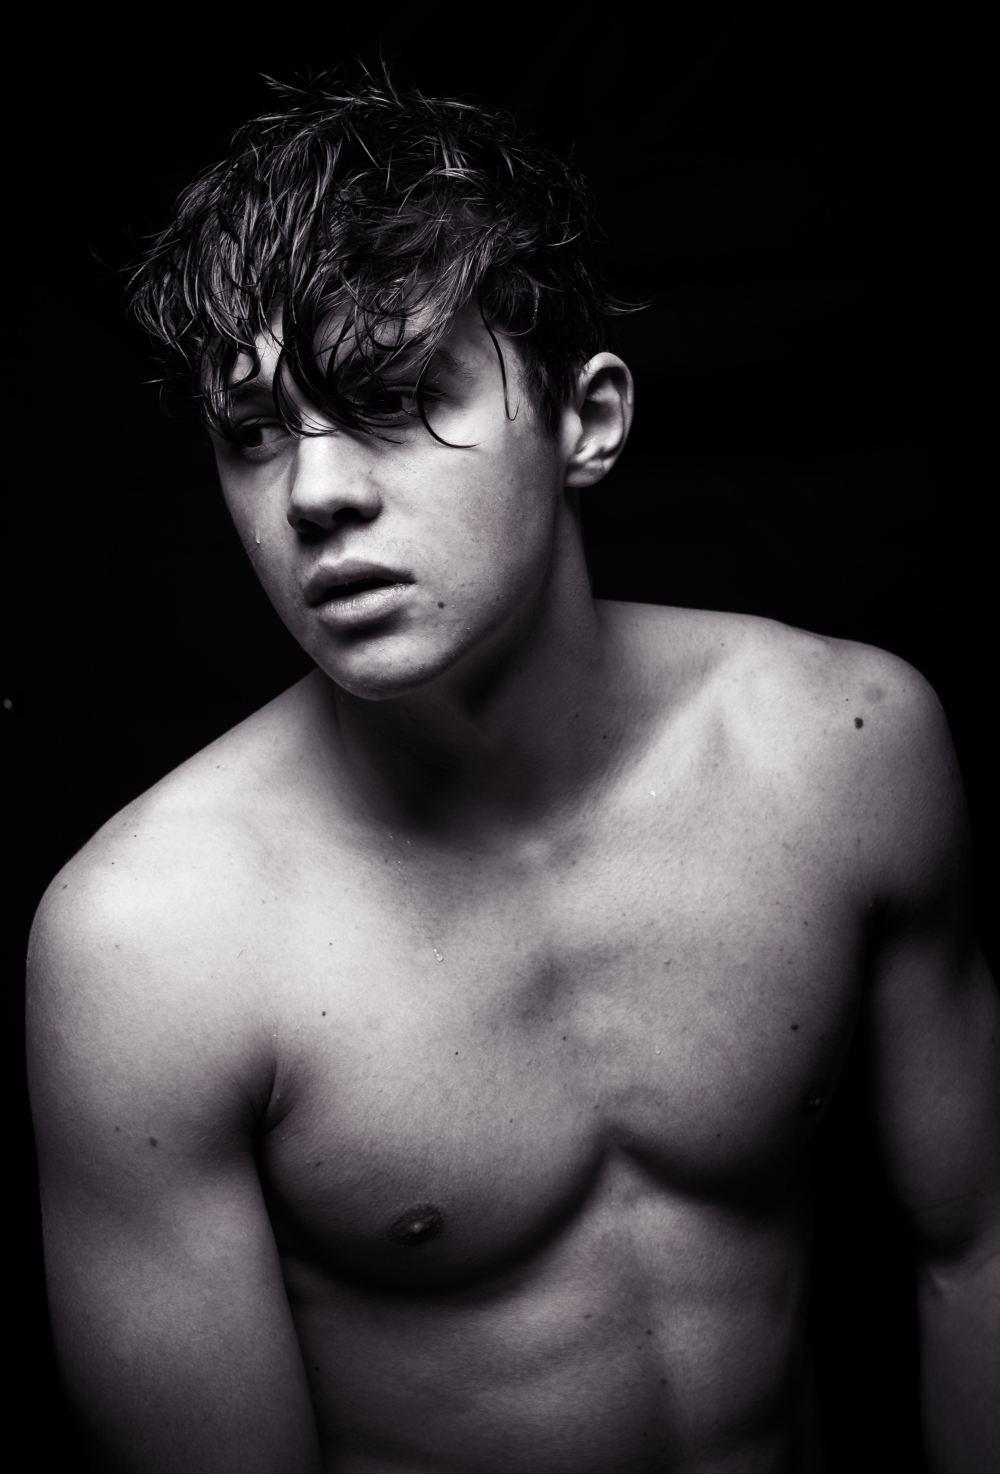 Hot Boy Picture : picture, Pictures, Download, Images, Unsplash